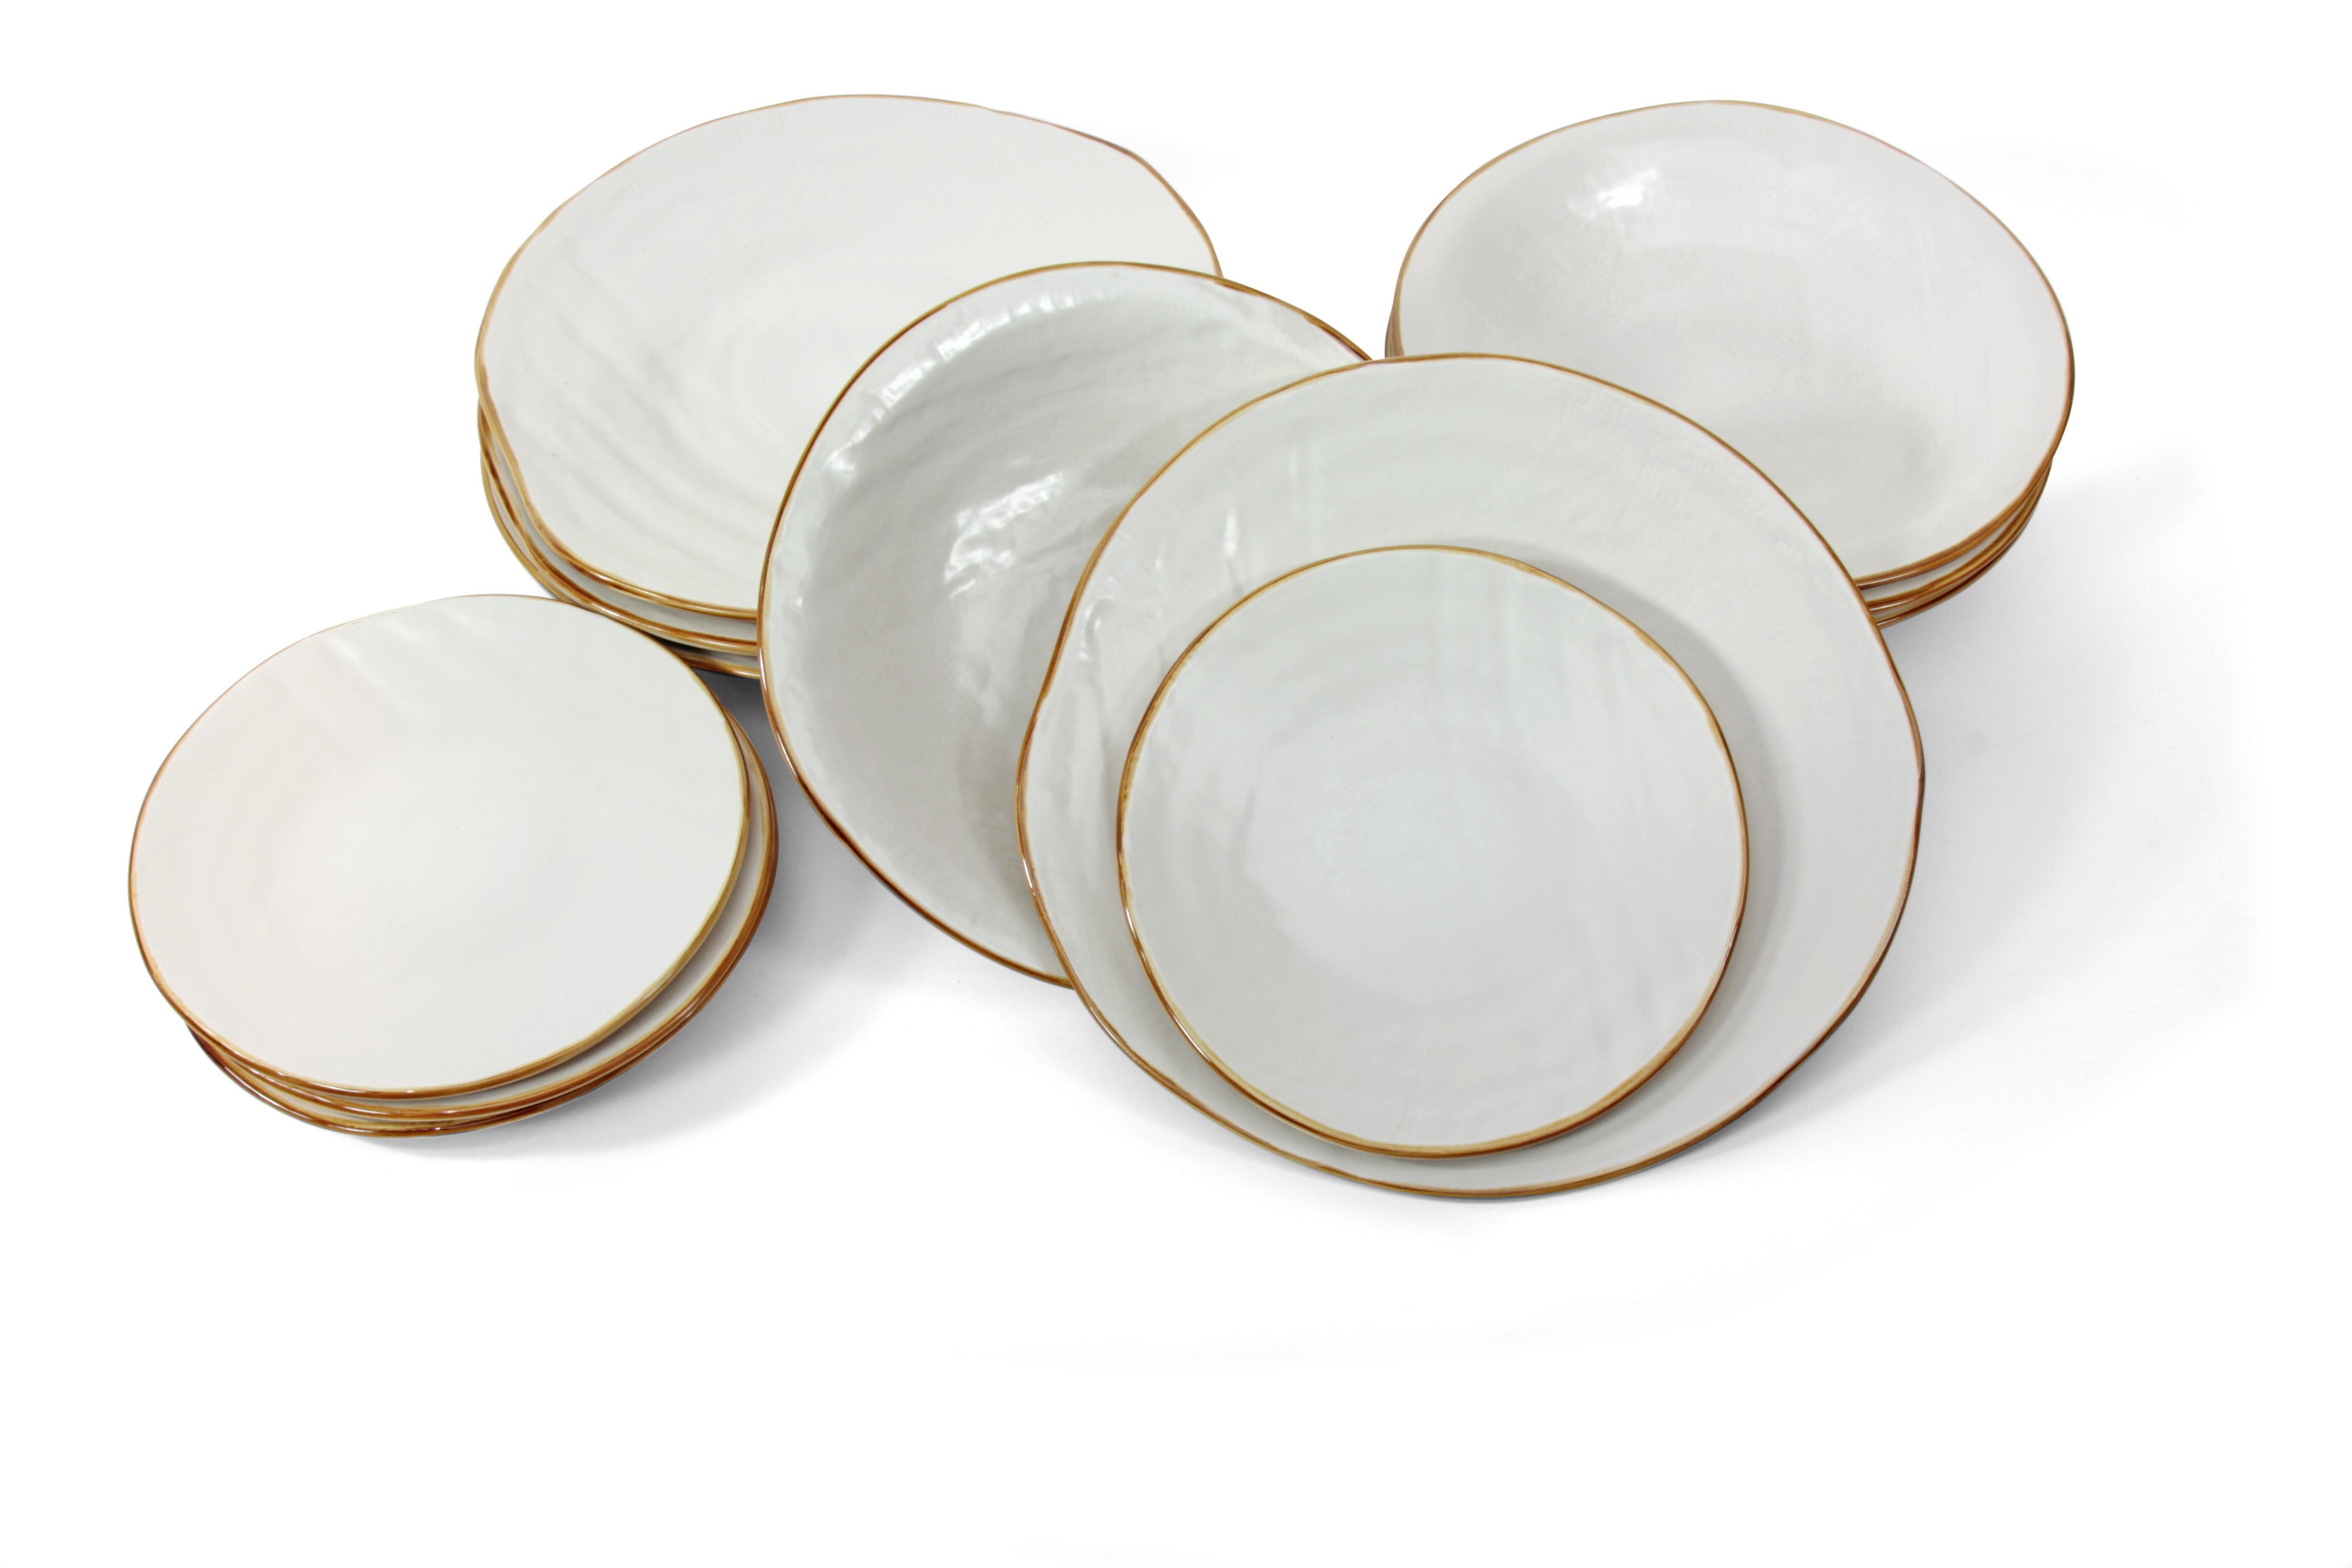 piatti bianchi dipinti a mano